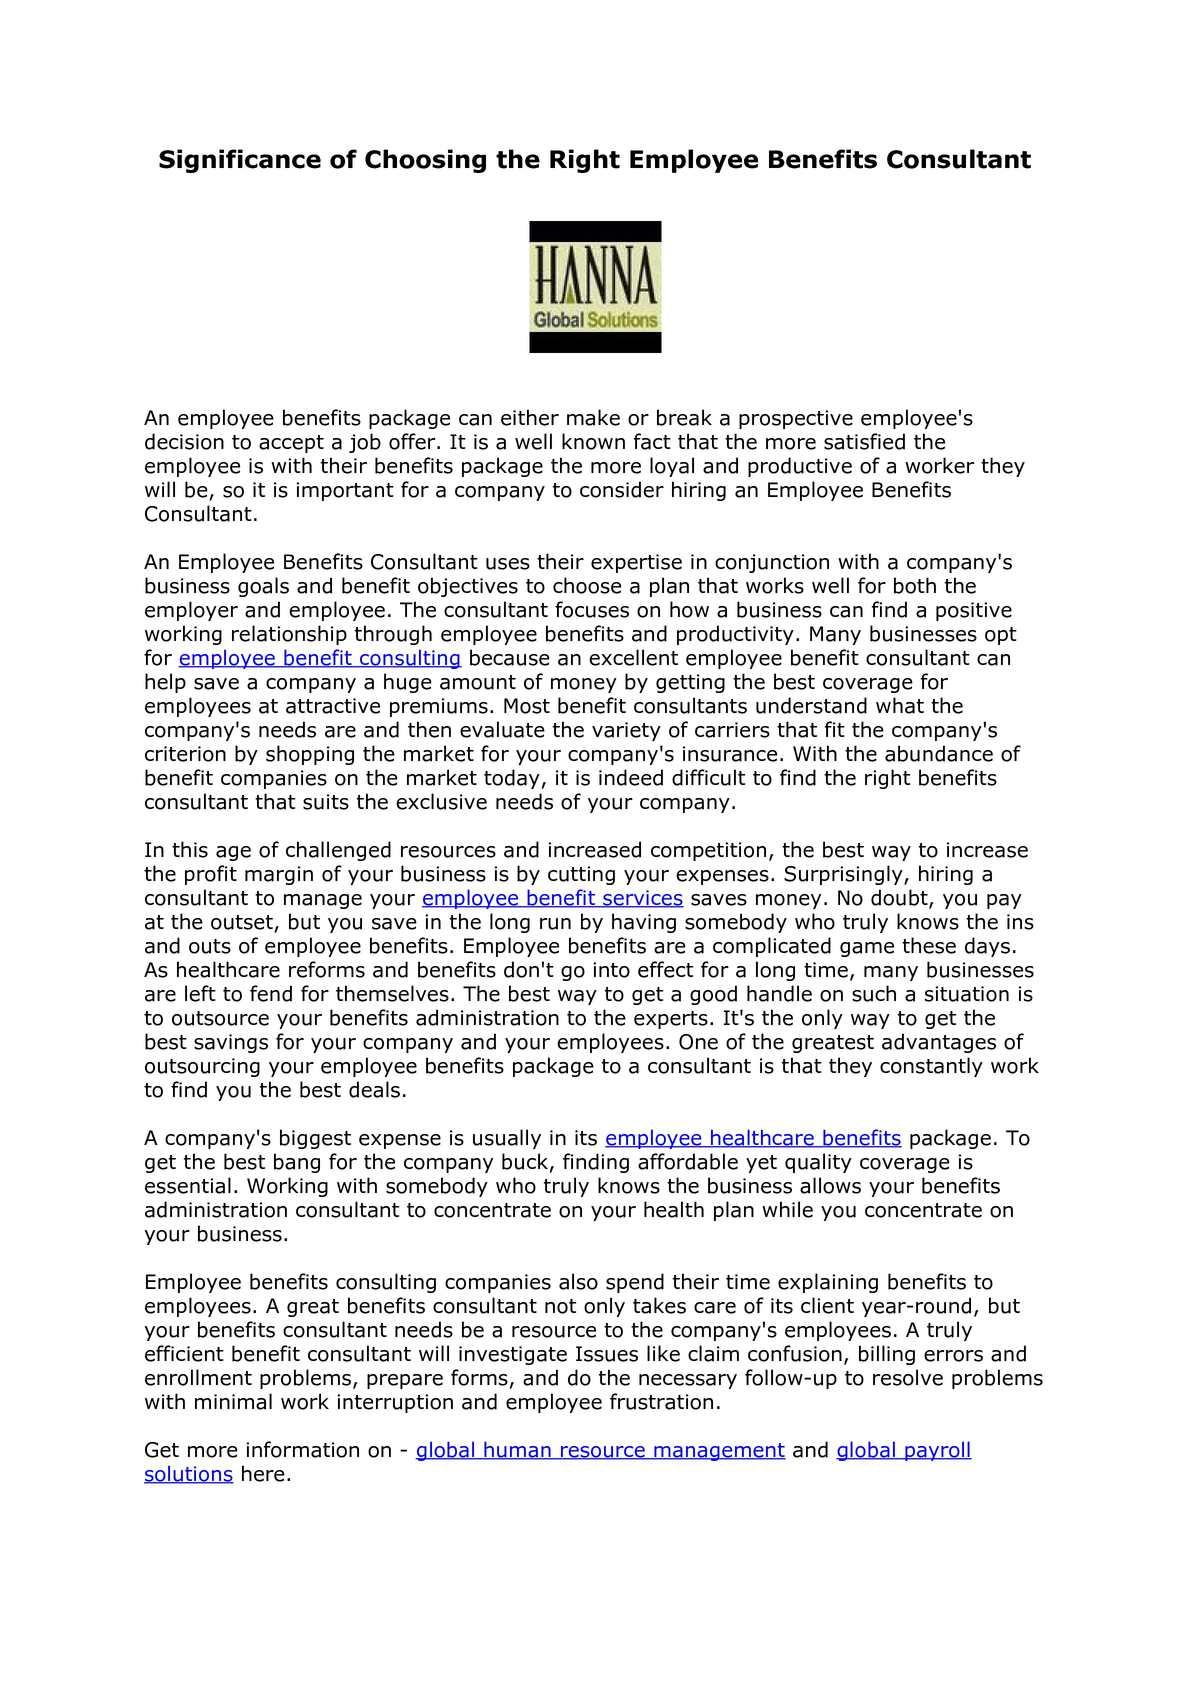 benefits consultant resume job description